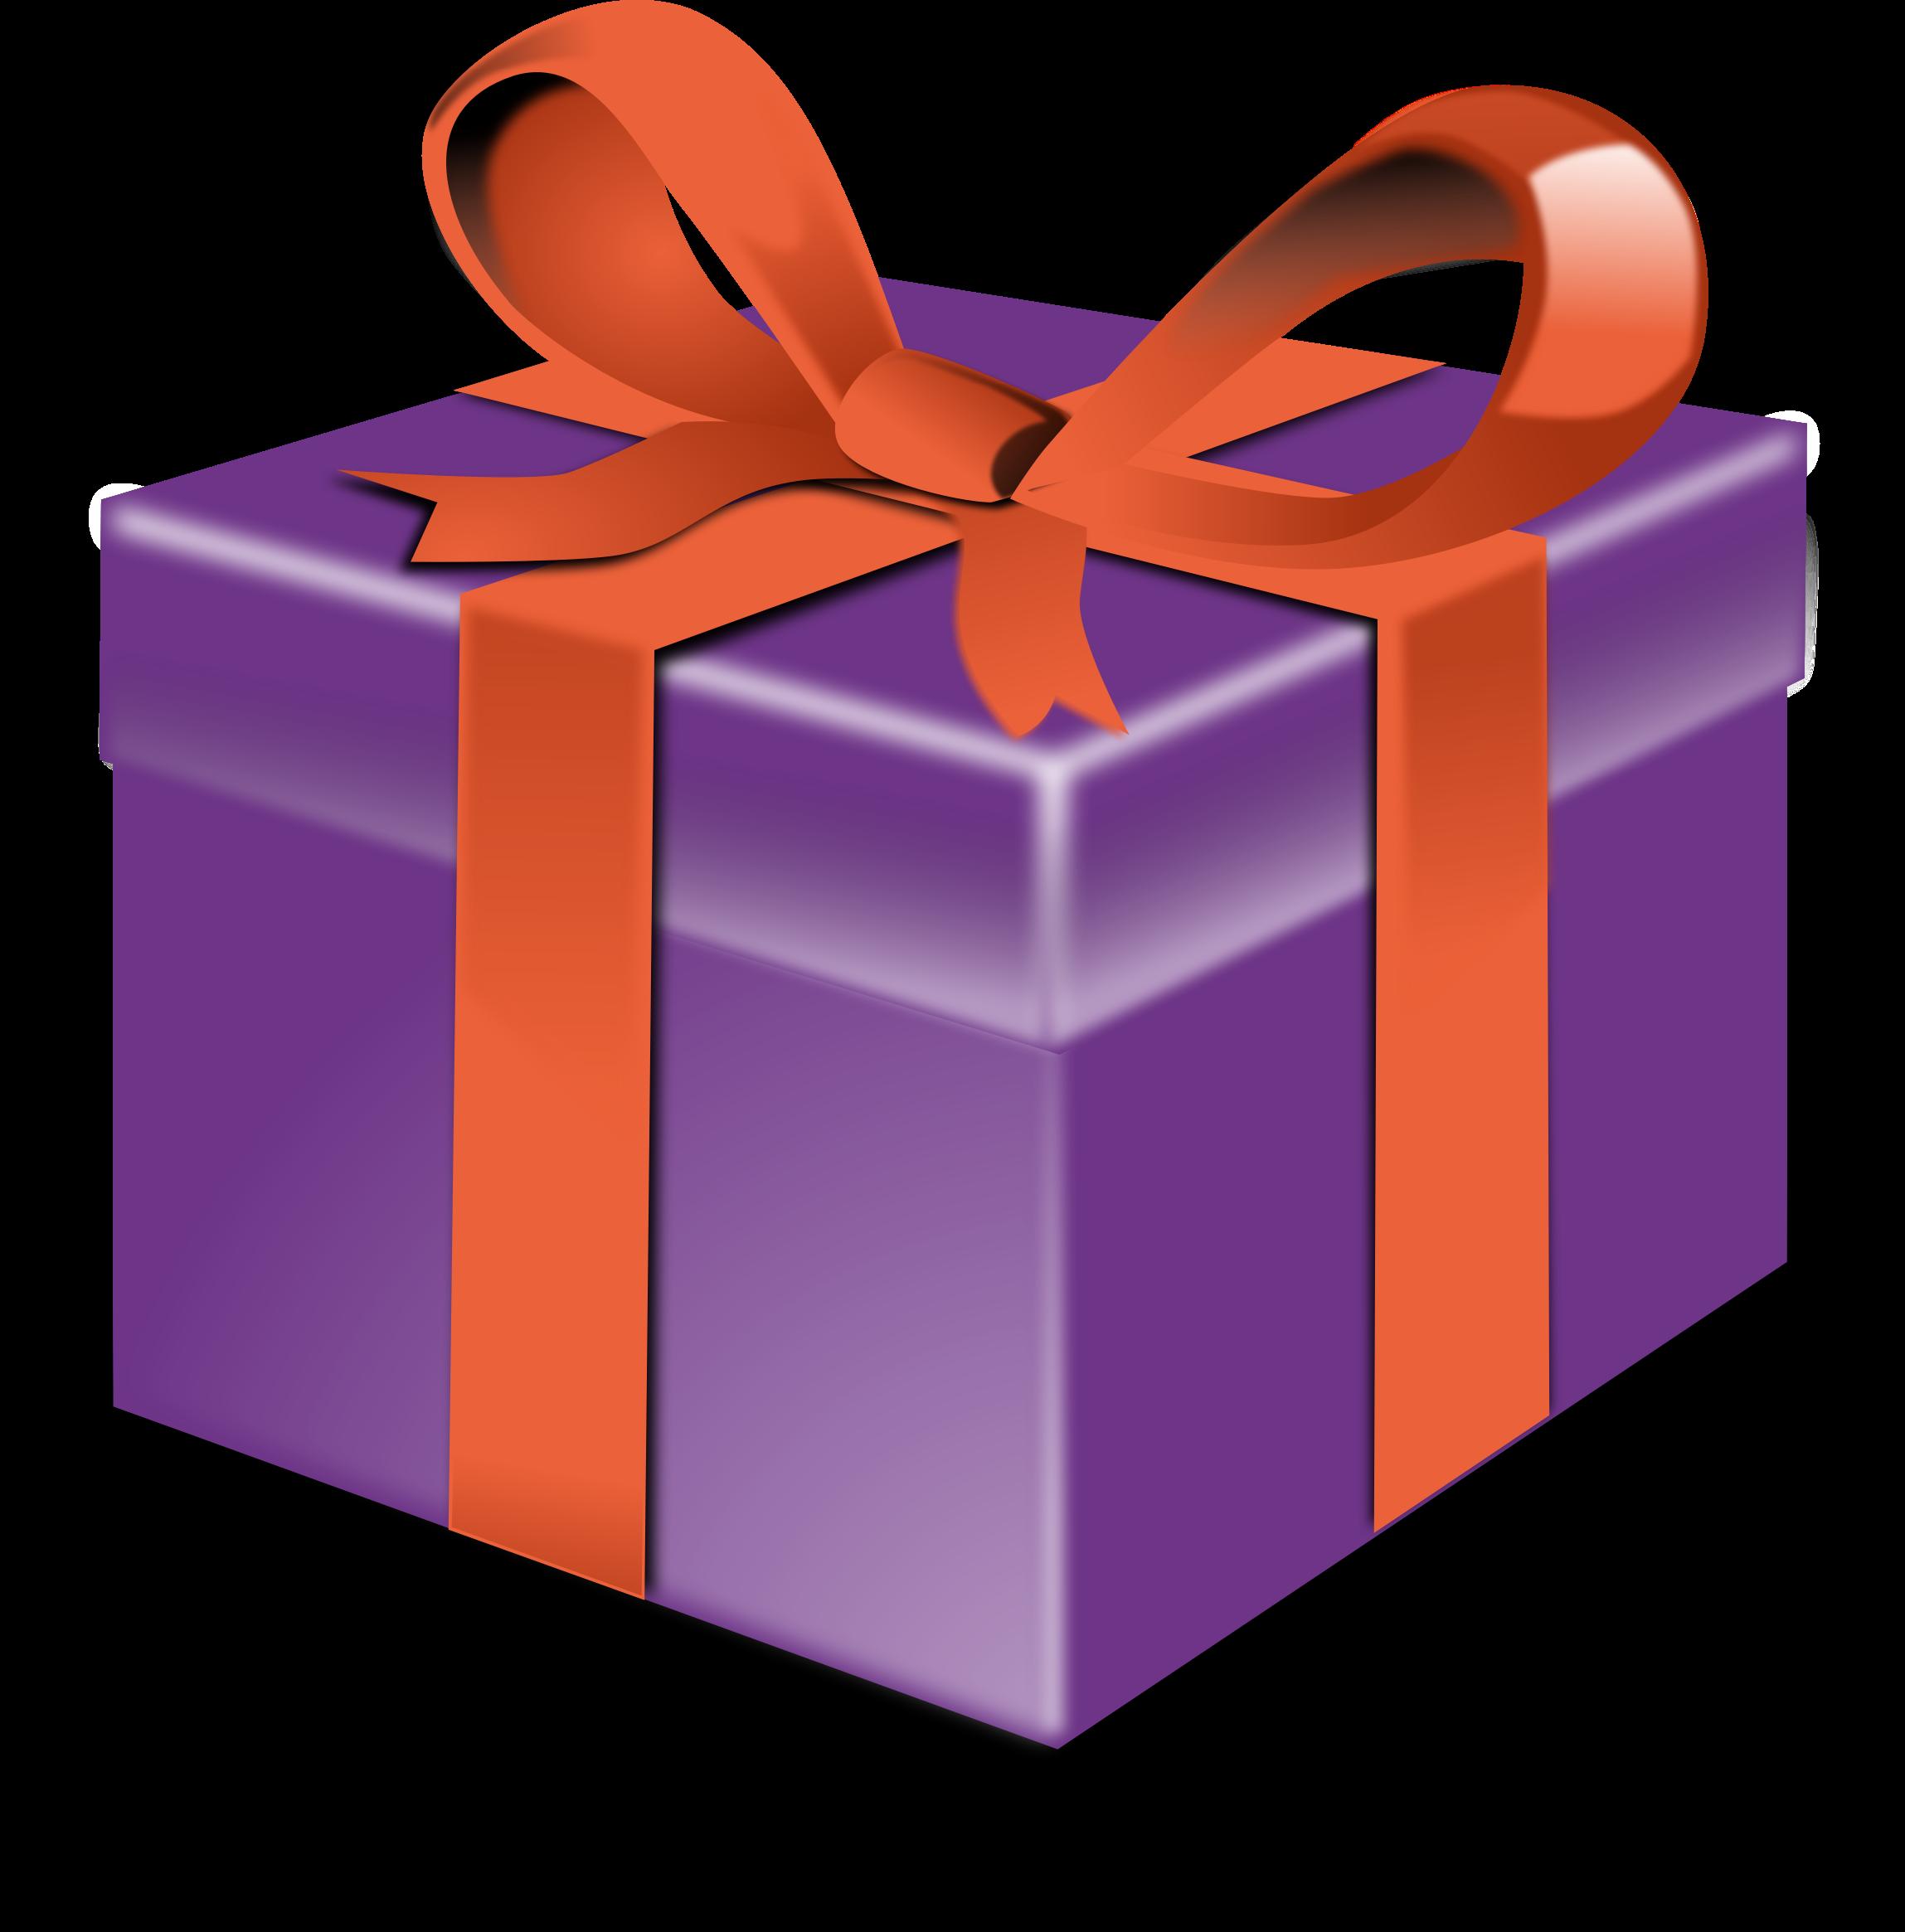 Purple orange ribbon image. Gift clipart big present